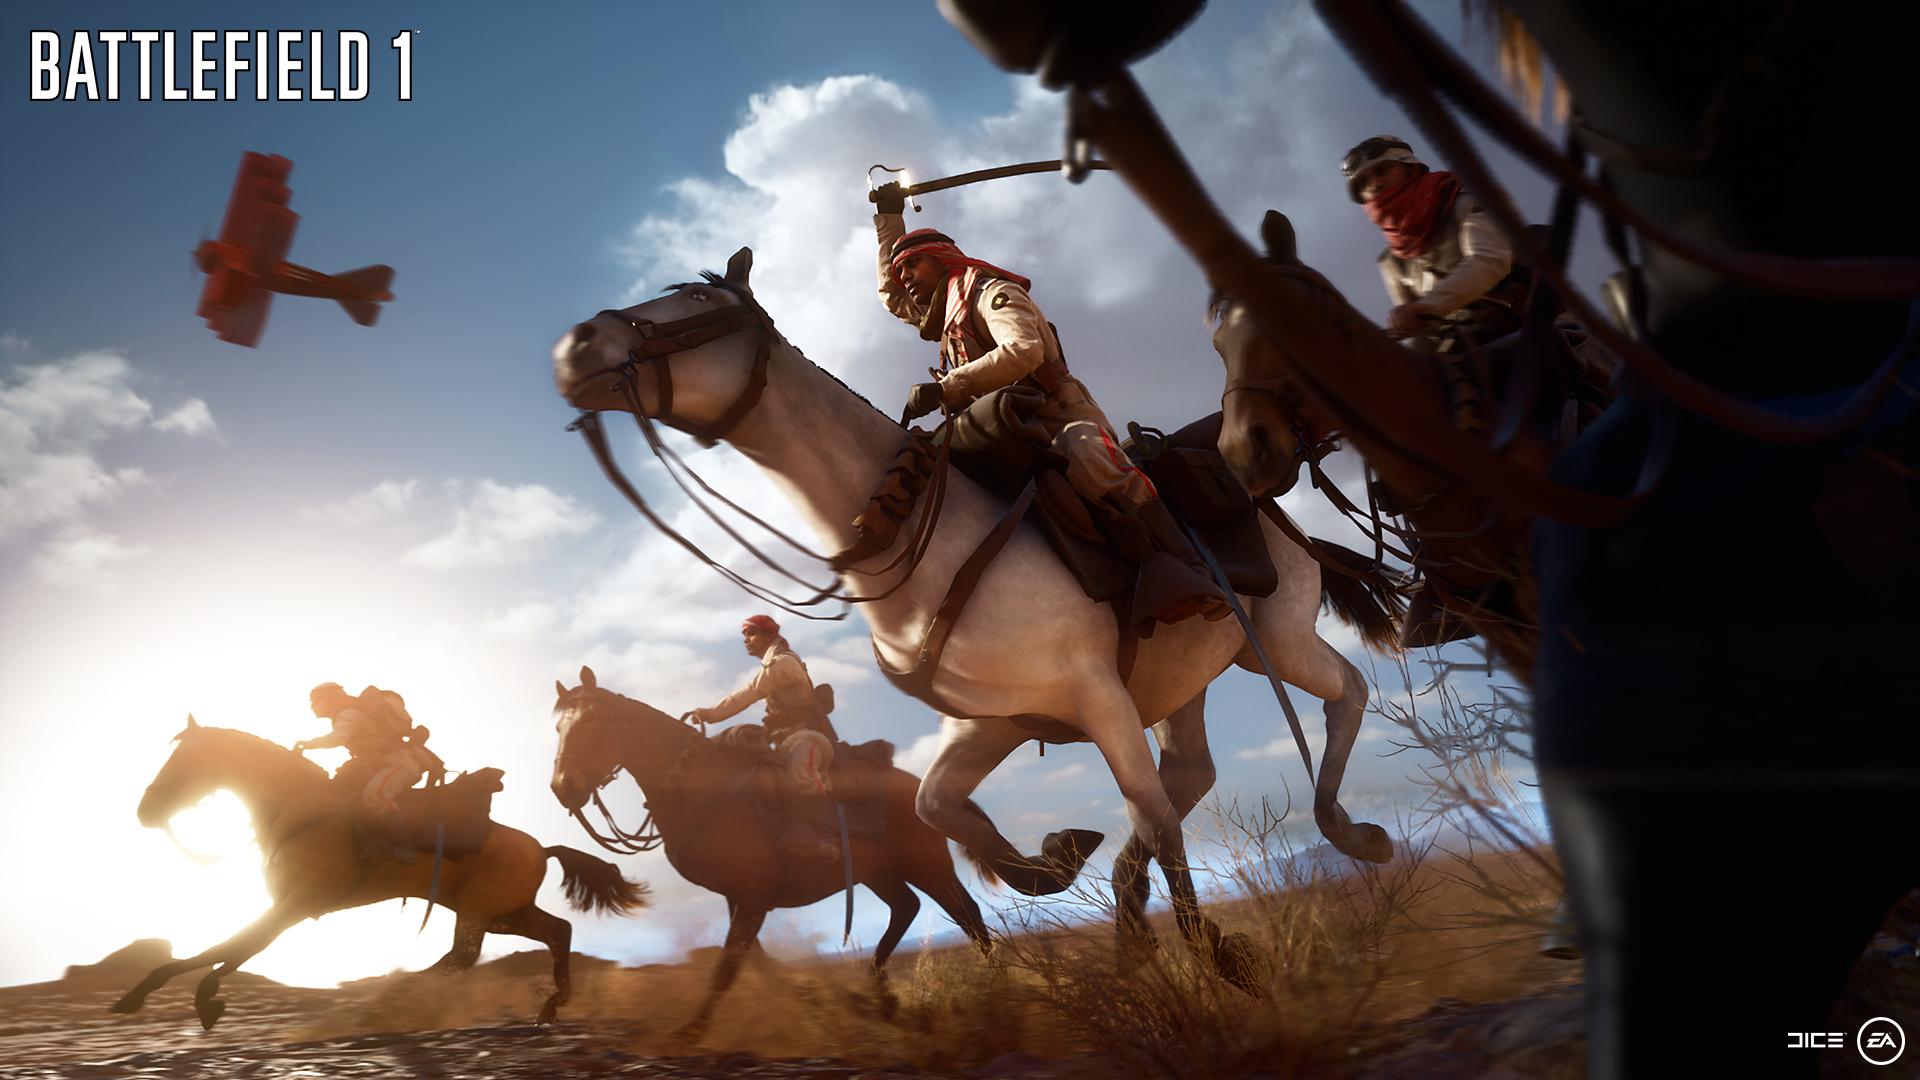 Battlefield 1 - Horses